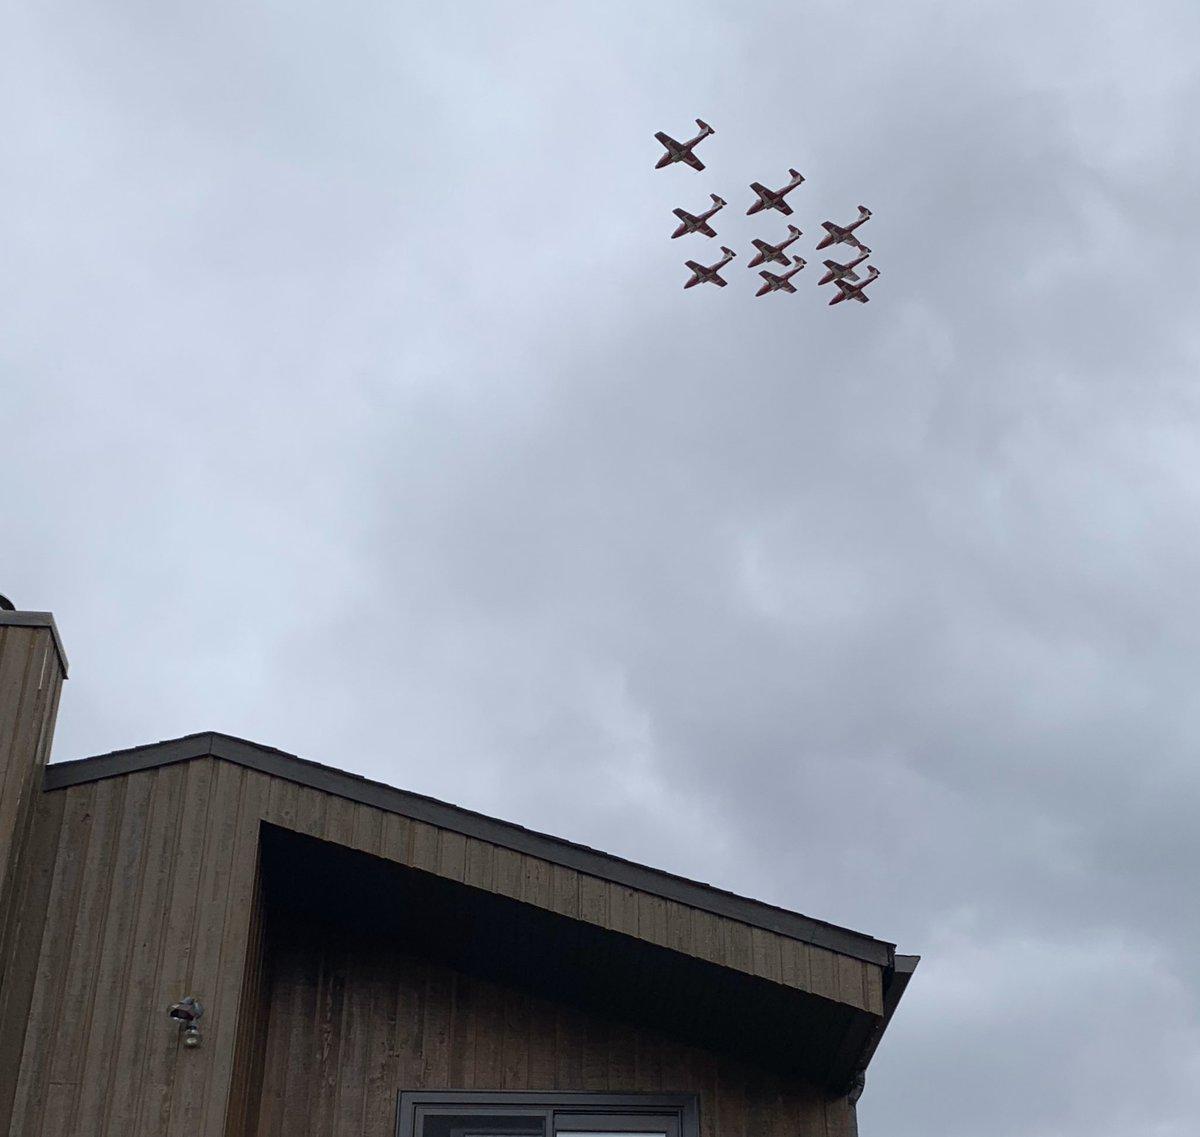 @momsgot2run @CFSnowbirds It was a treat to see them up close. Talented Canadian pilots!